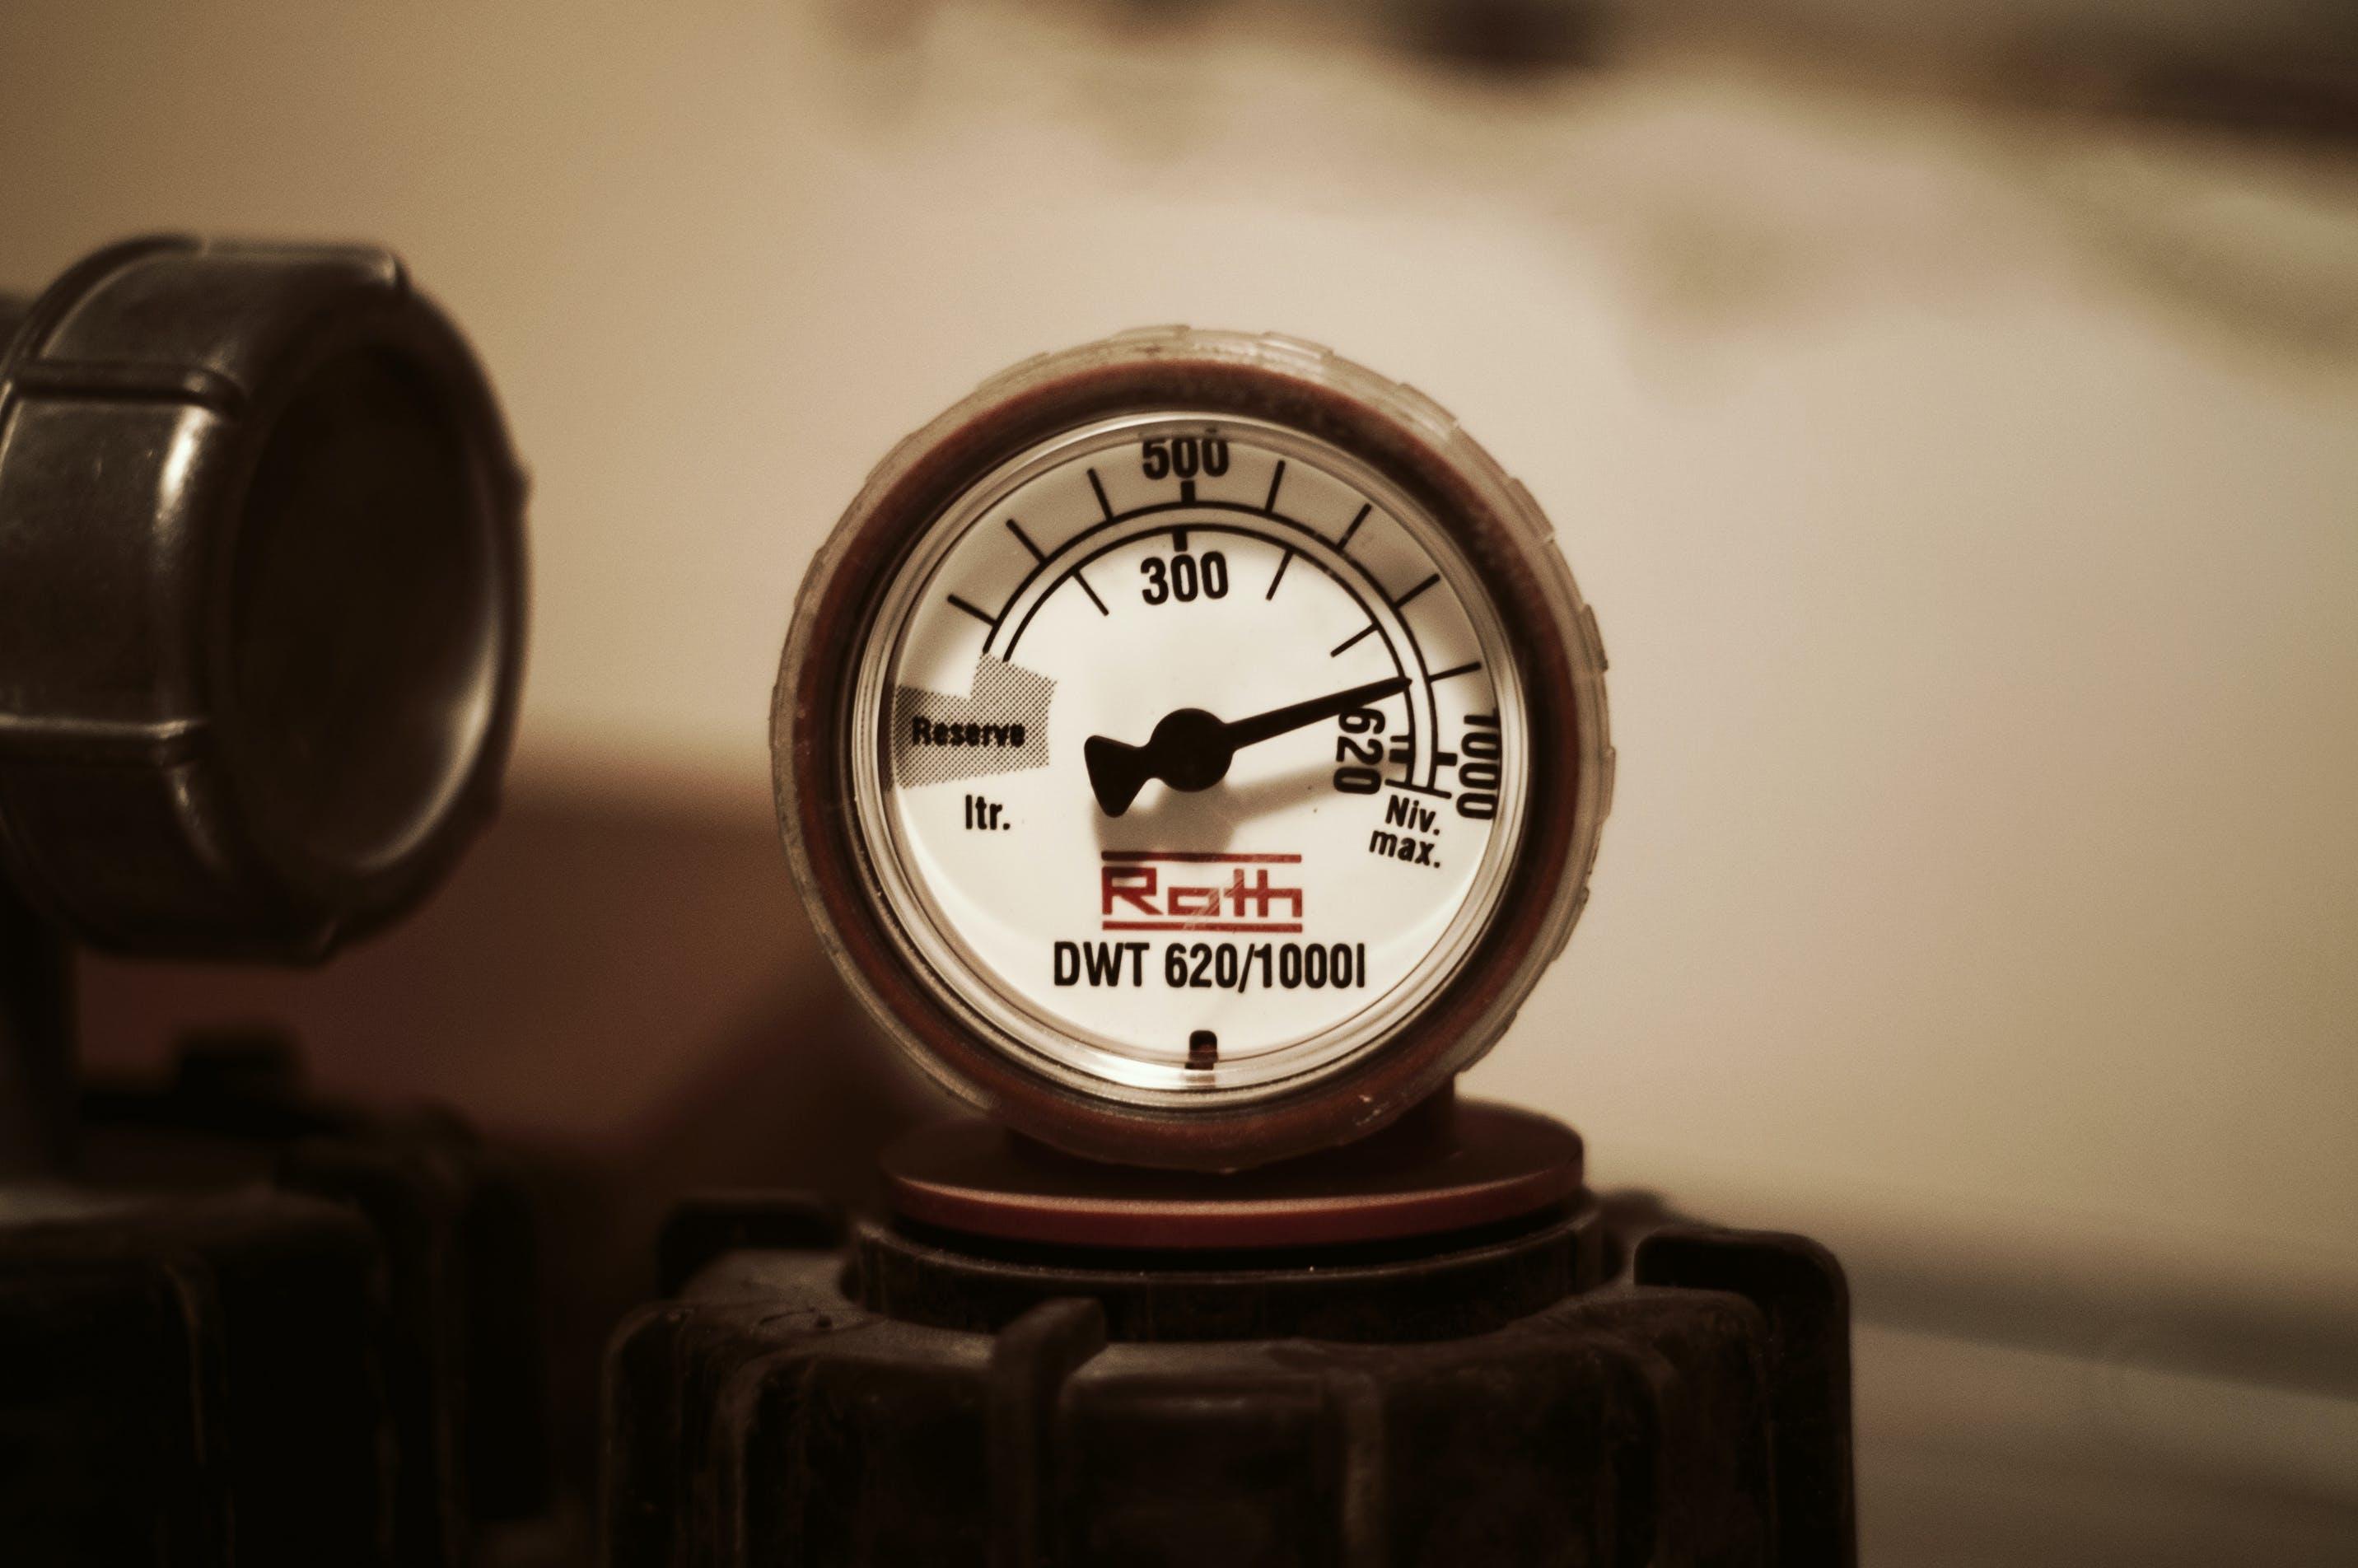 Free stock photo of meter, heating